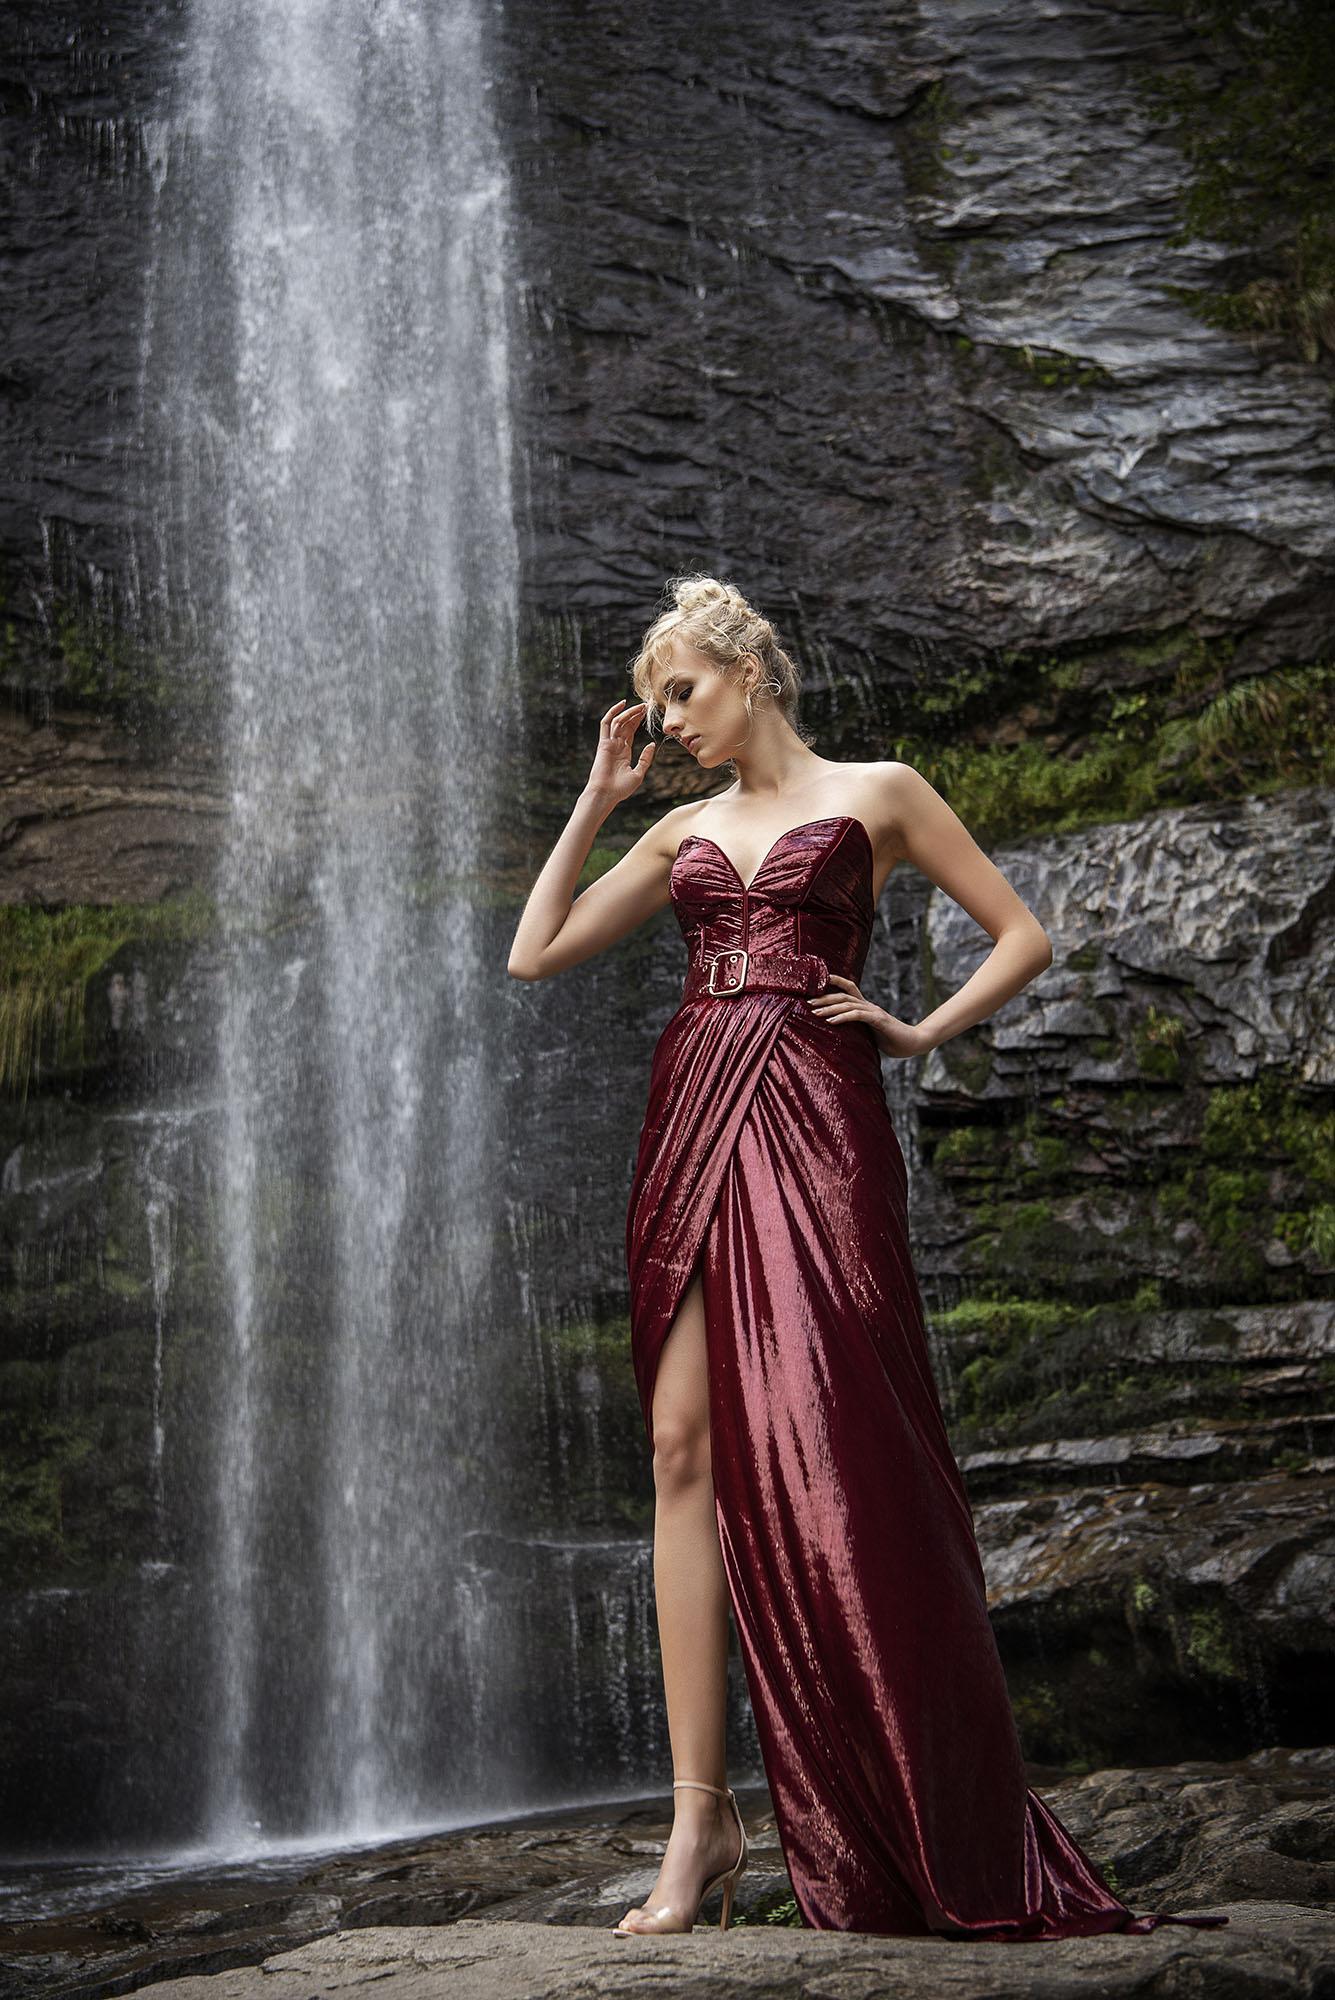 Moda_Fotograflari_Fashion_Ugur_Bektas_00002.jpg